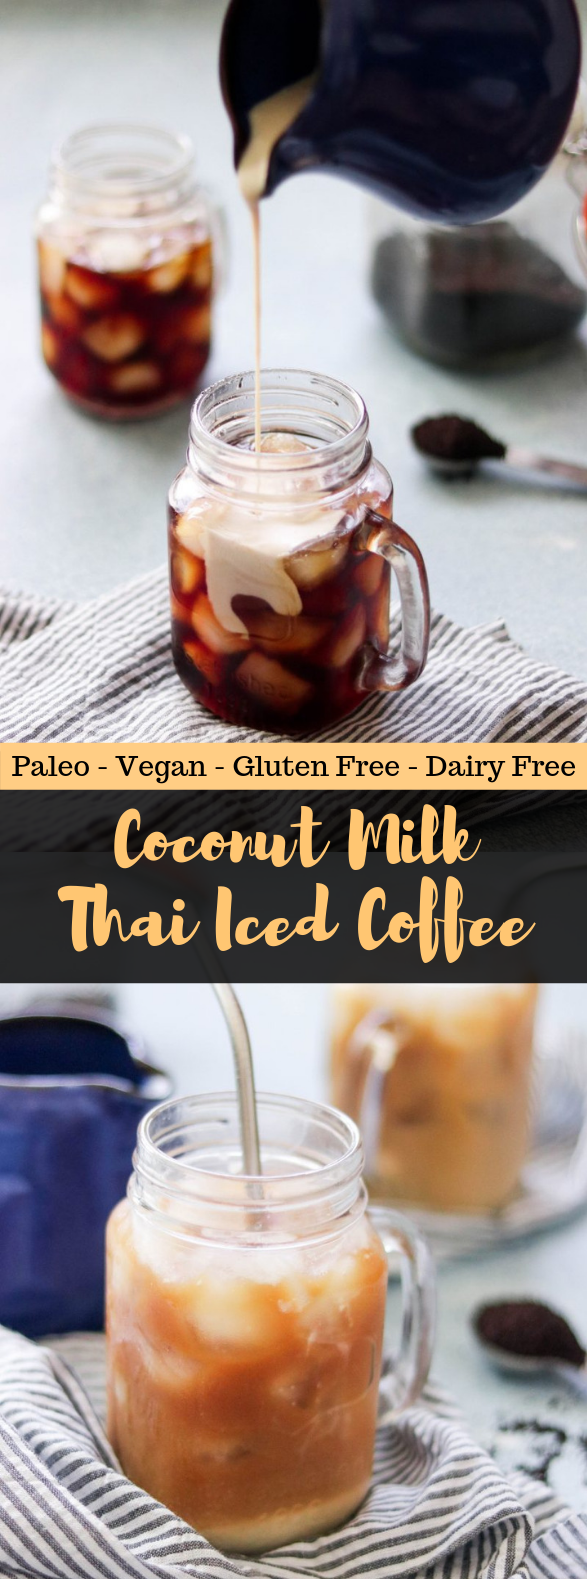 COCONUT MILK THAI ICED COFFEE (PALEO, VEGAN) #healthydrink #coffedrink